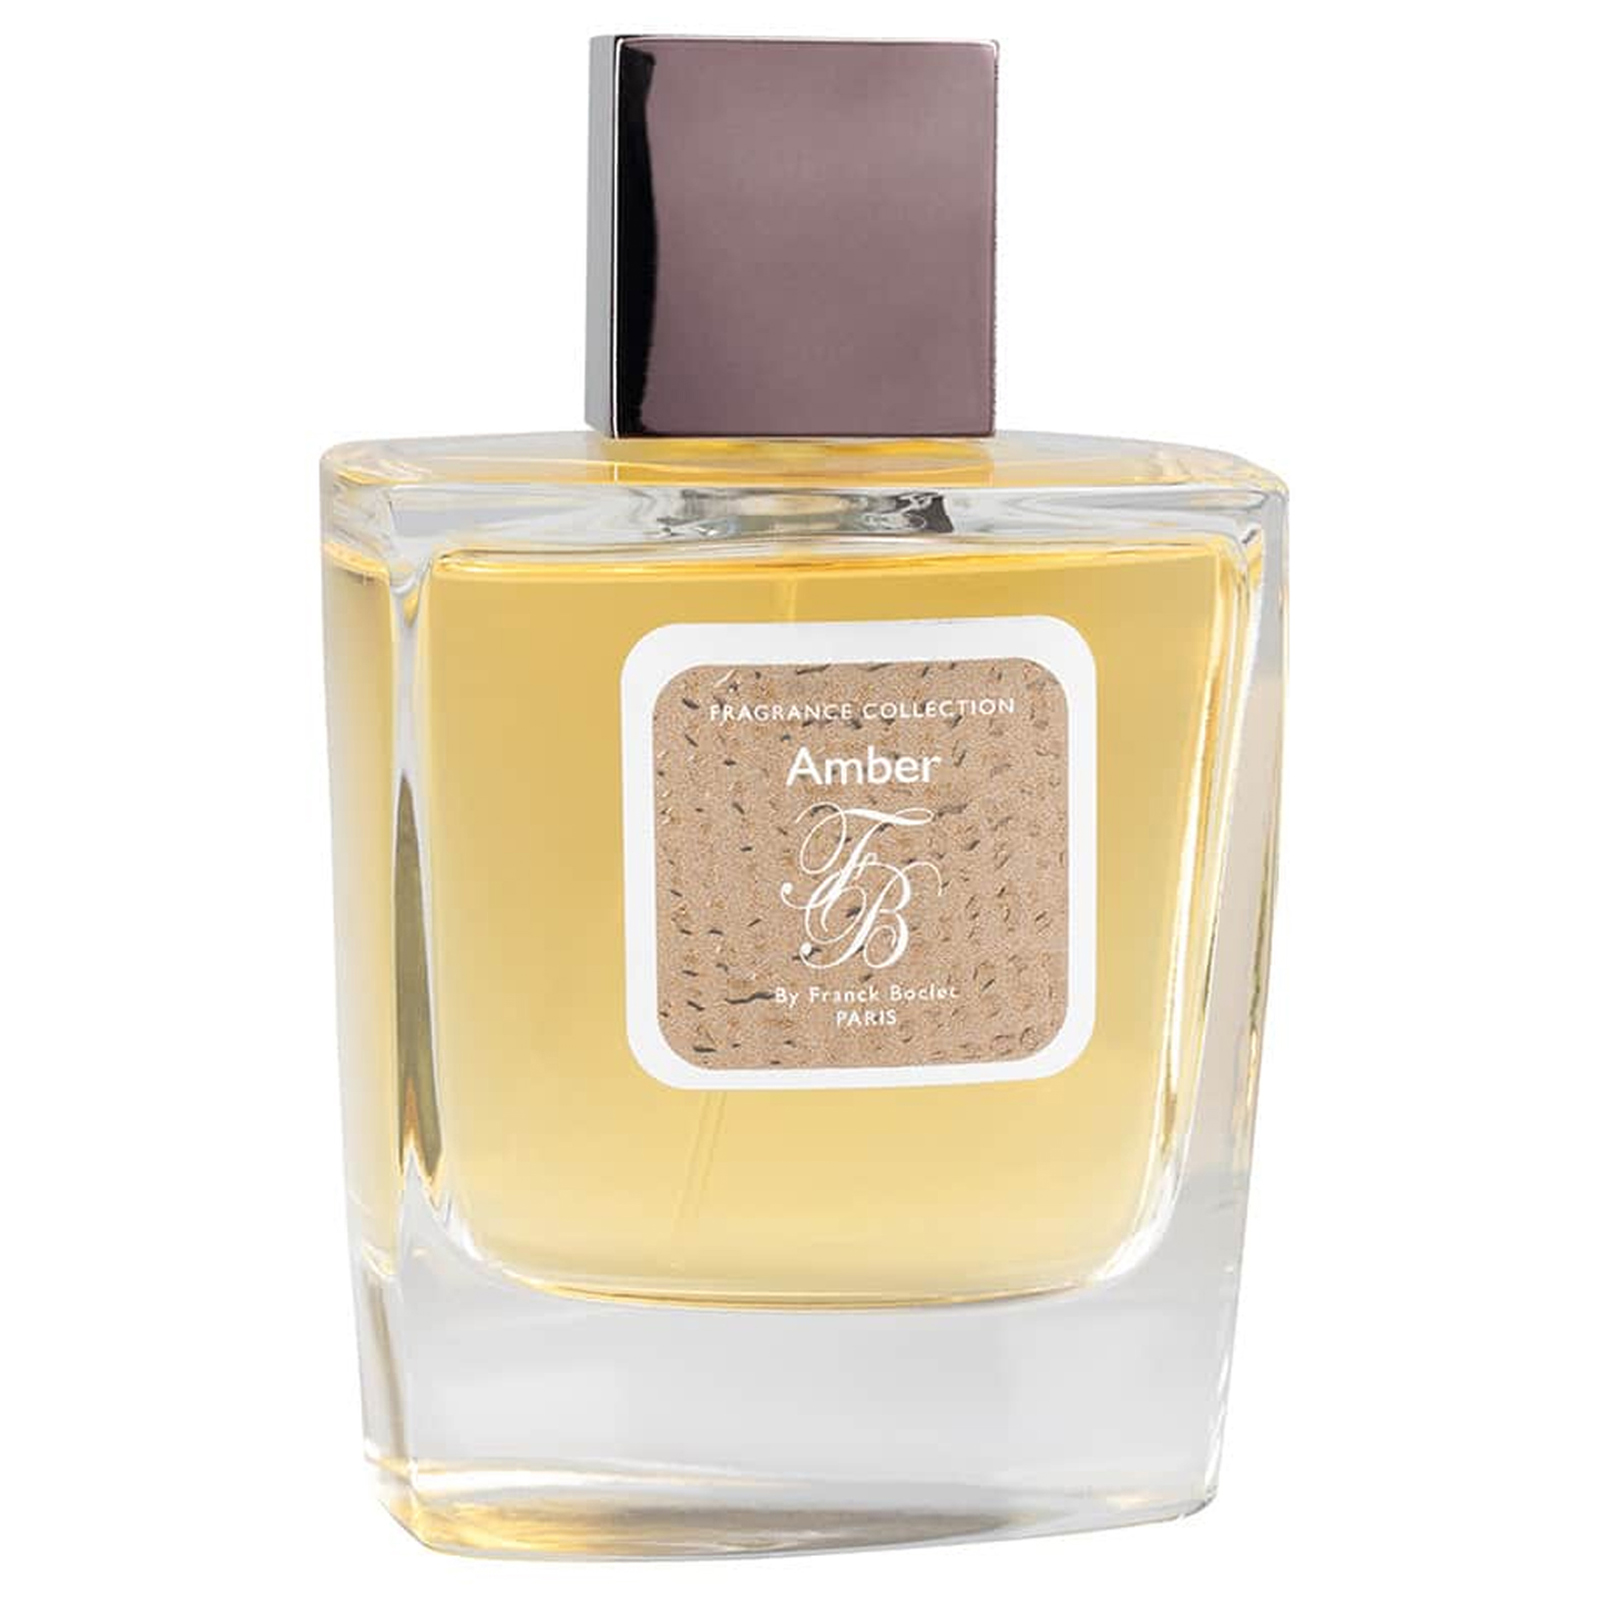 Amber profumo eau de parfum 100 ml